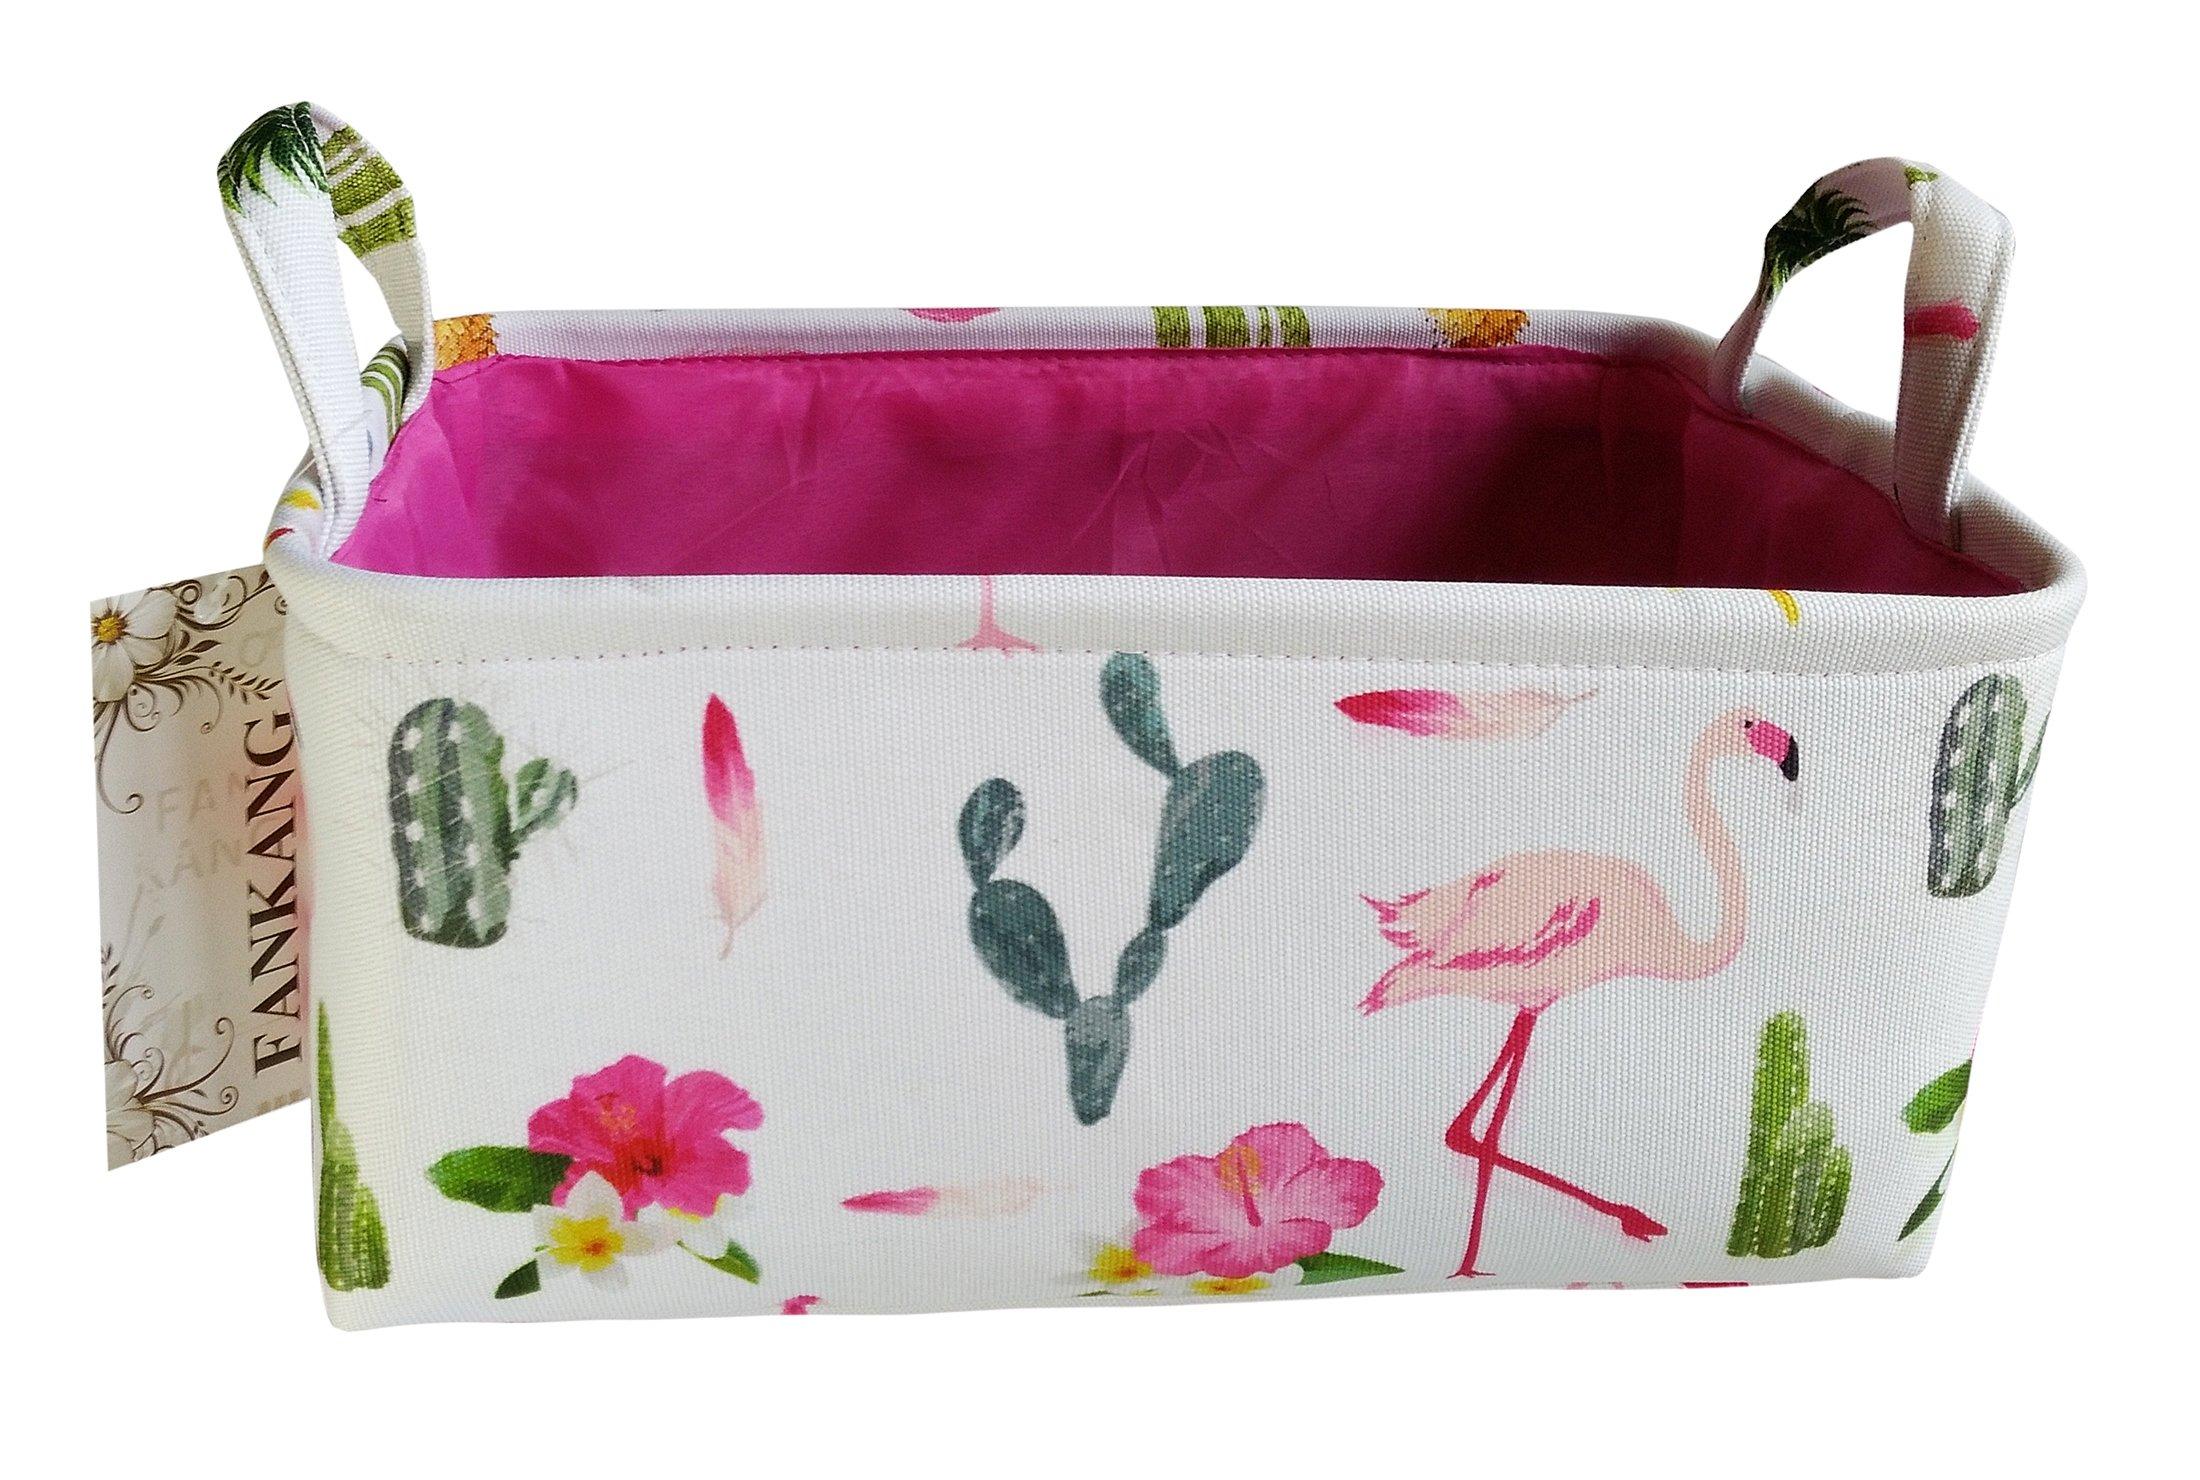 Rectangular Fabric Storage Bin Toy Box Baby Laundry Basket with Flamingo Prints for Kids Toys and Nursery Storage, Baby Hamper,Book Bag,Gift Baskets(Flamingo)